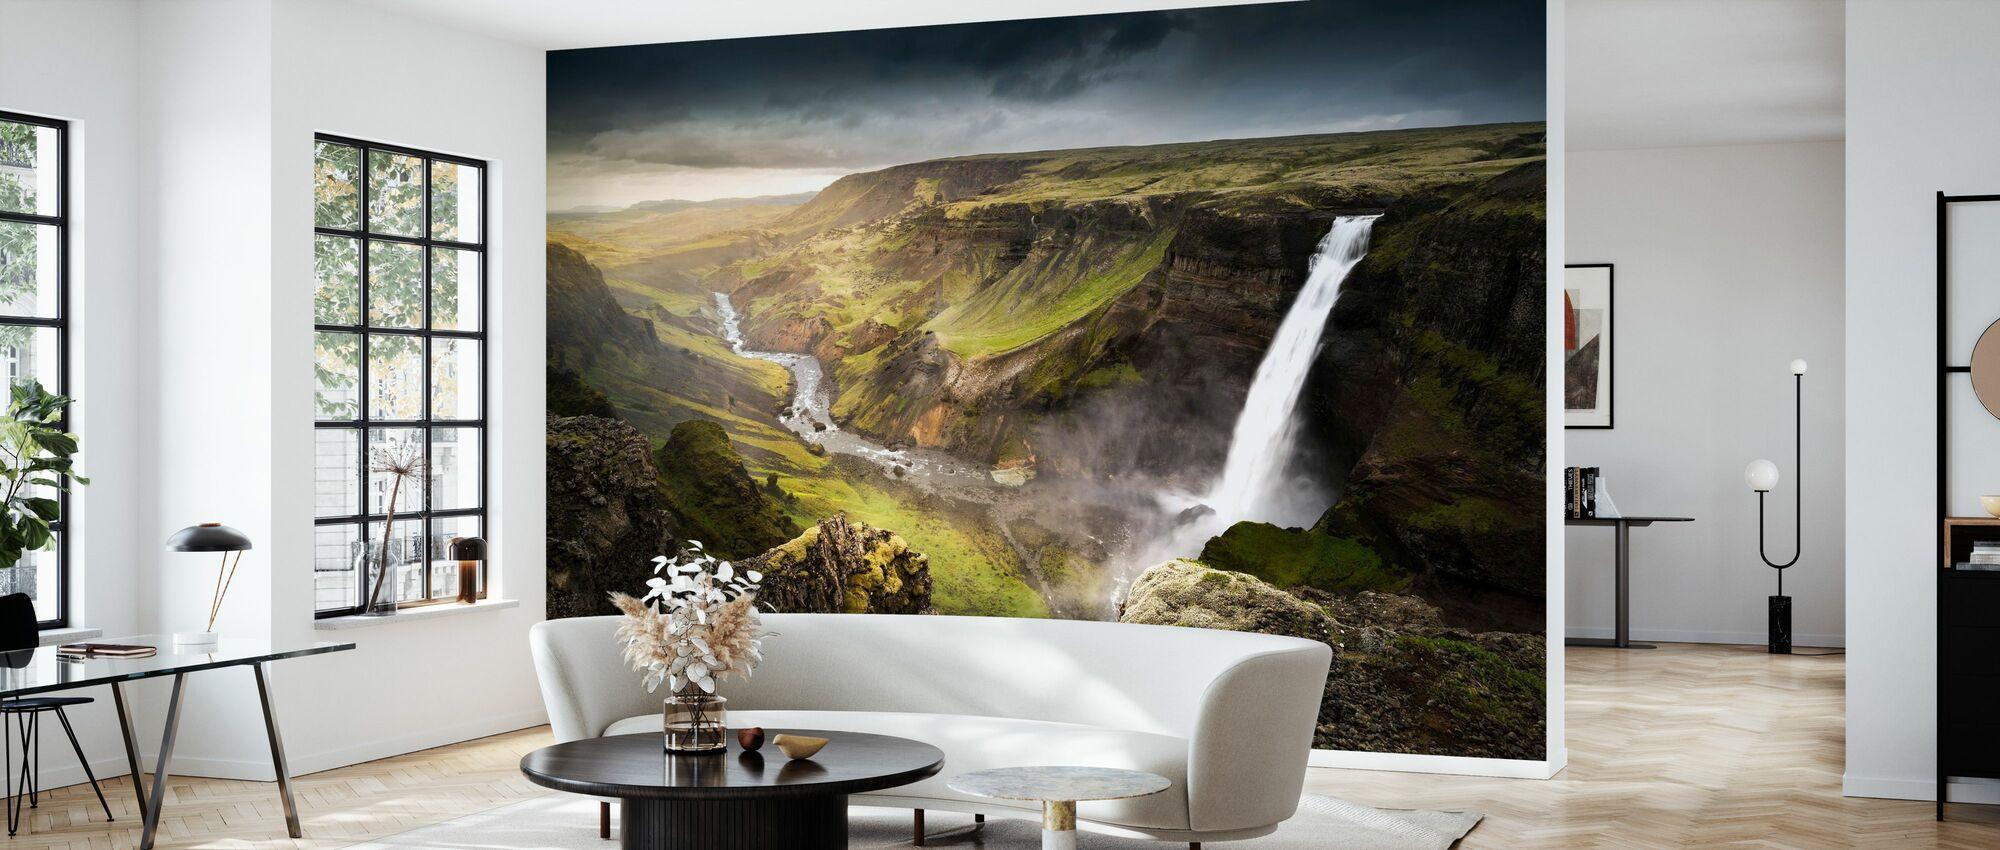 Haifoss Waterfall - Wallpaper - Living Room